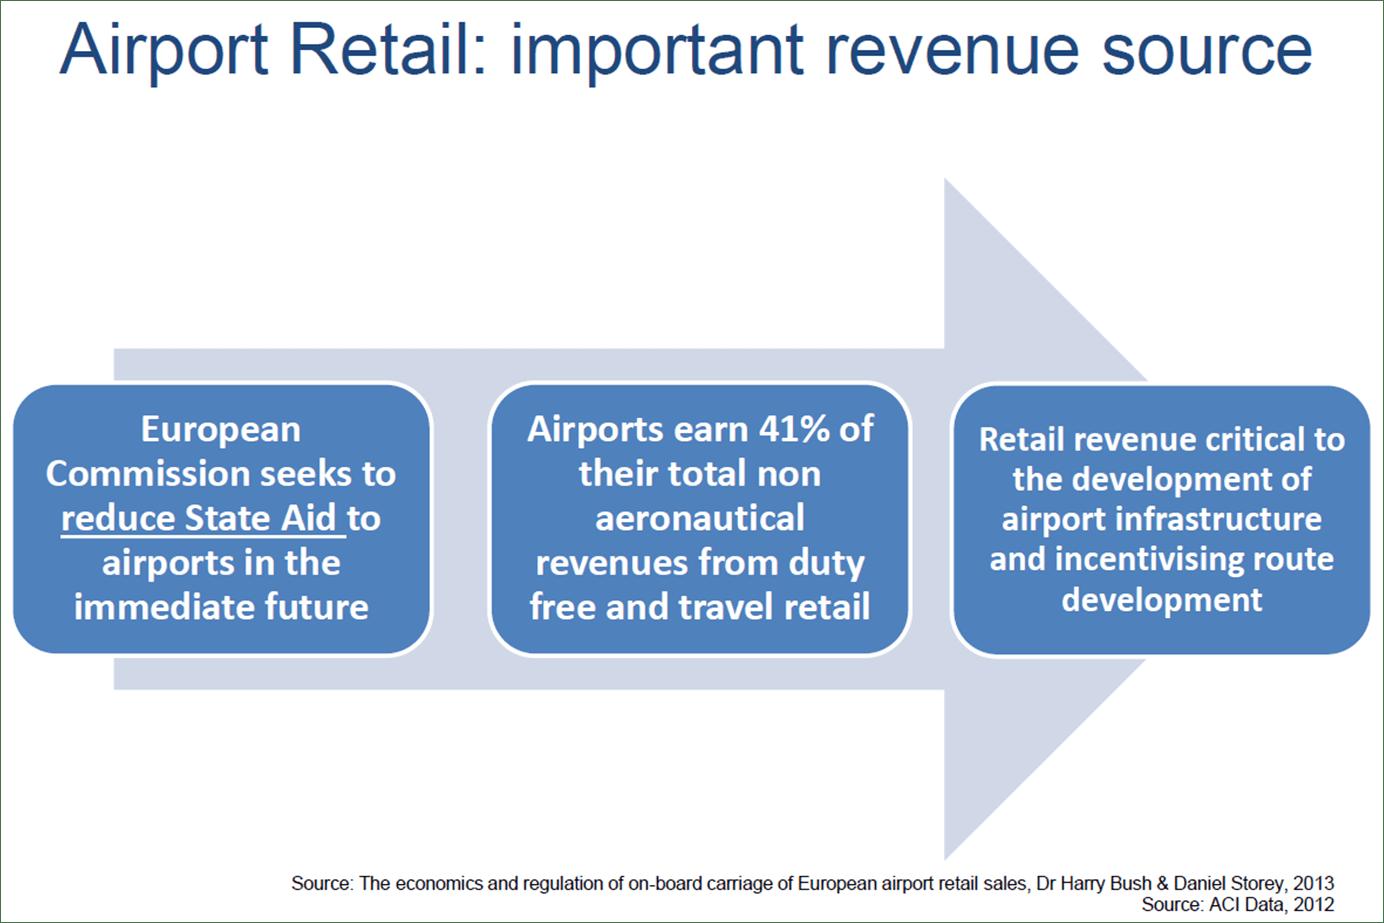 airport retail important source of revenue